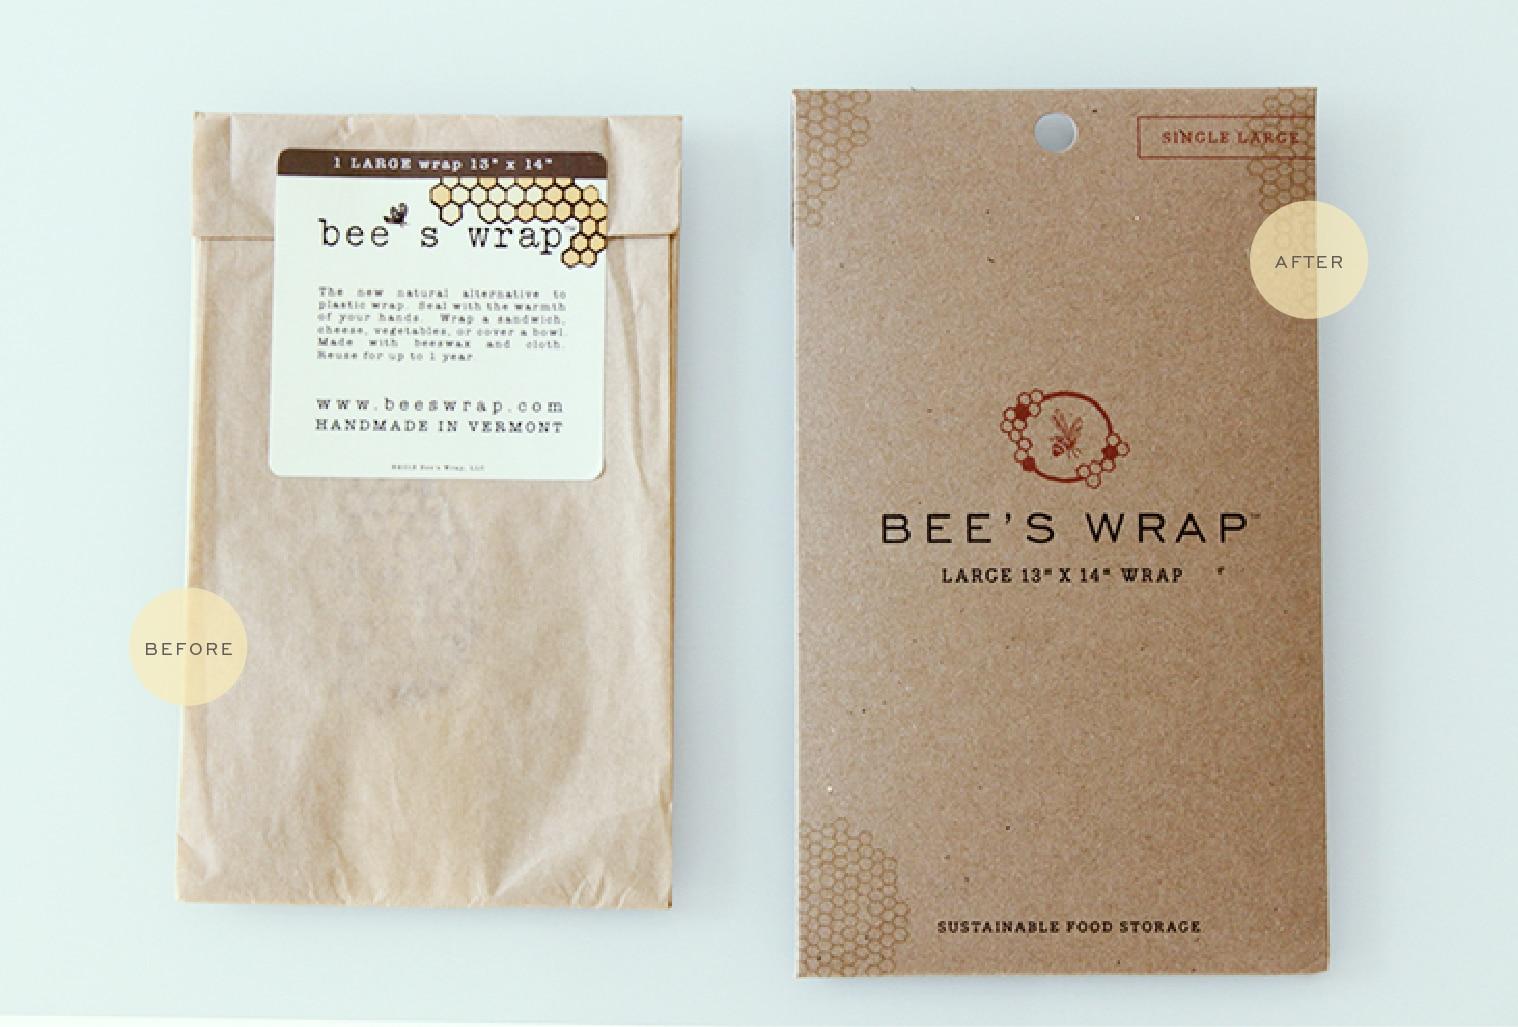 Beeswrap7